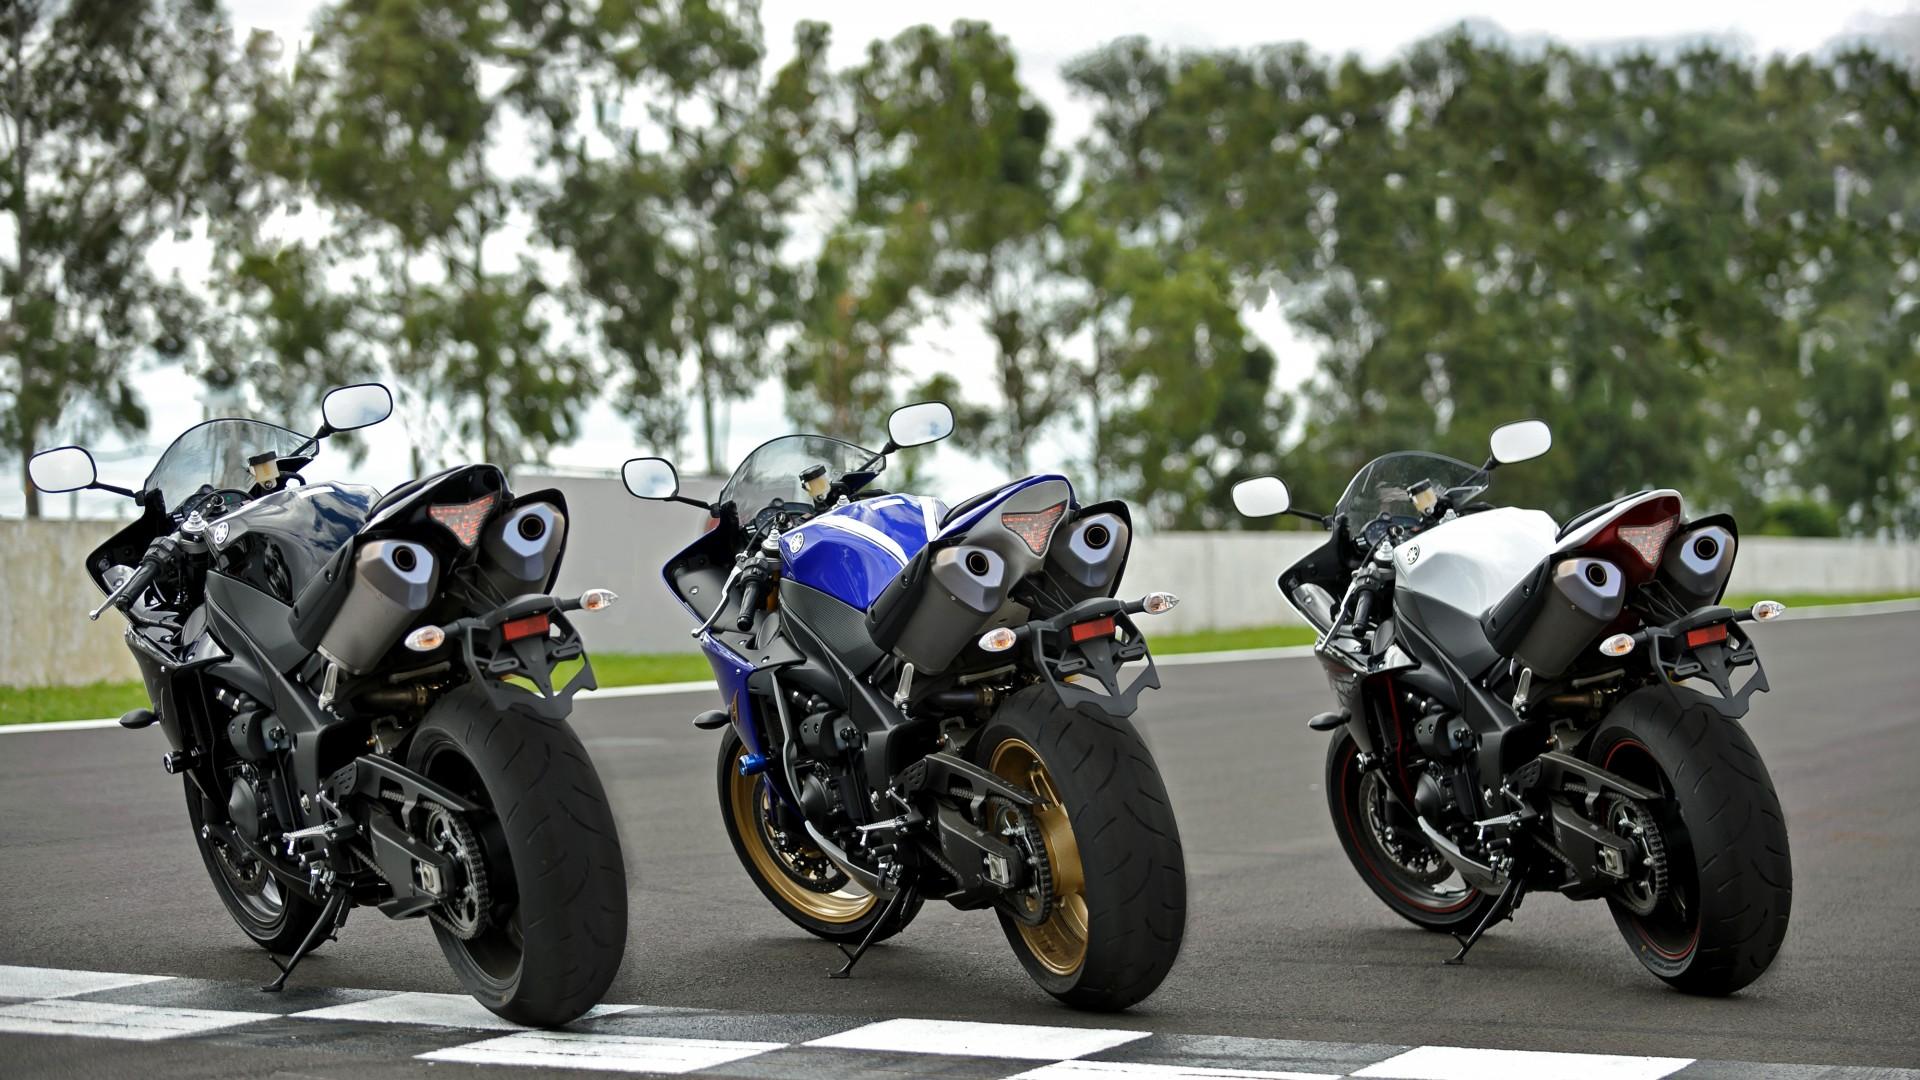 Yamaha R1 YZF Sportbike Superbike Bike Wallpaper Background 1920x1080